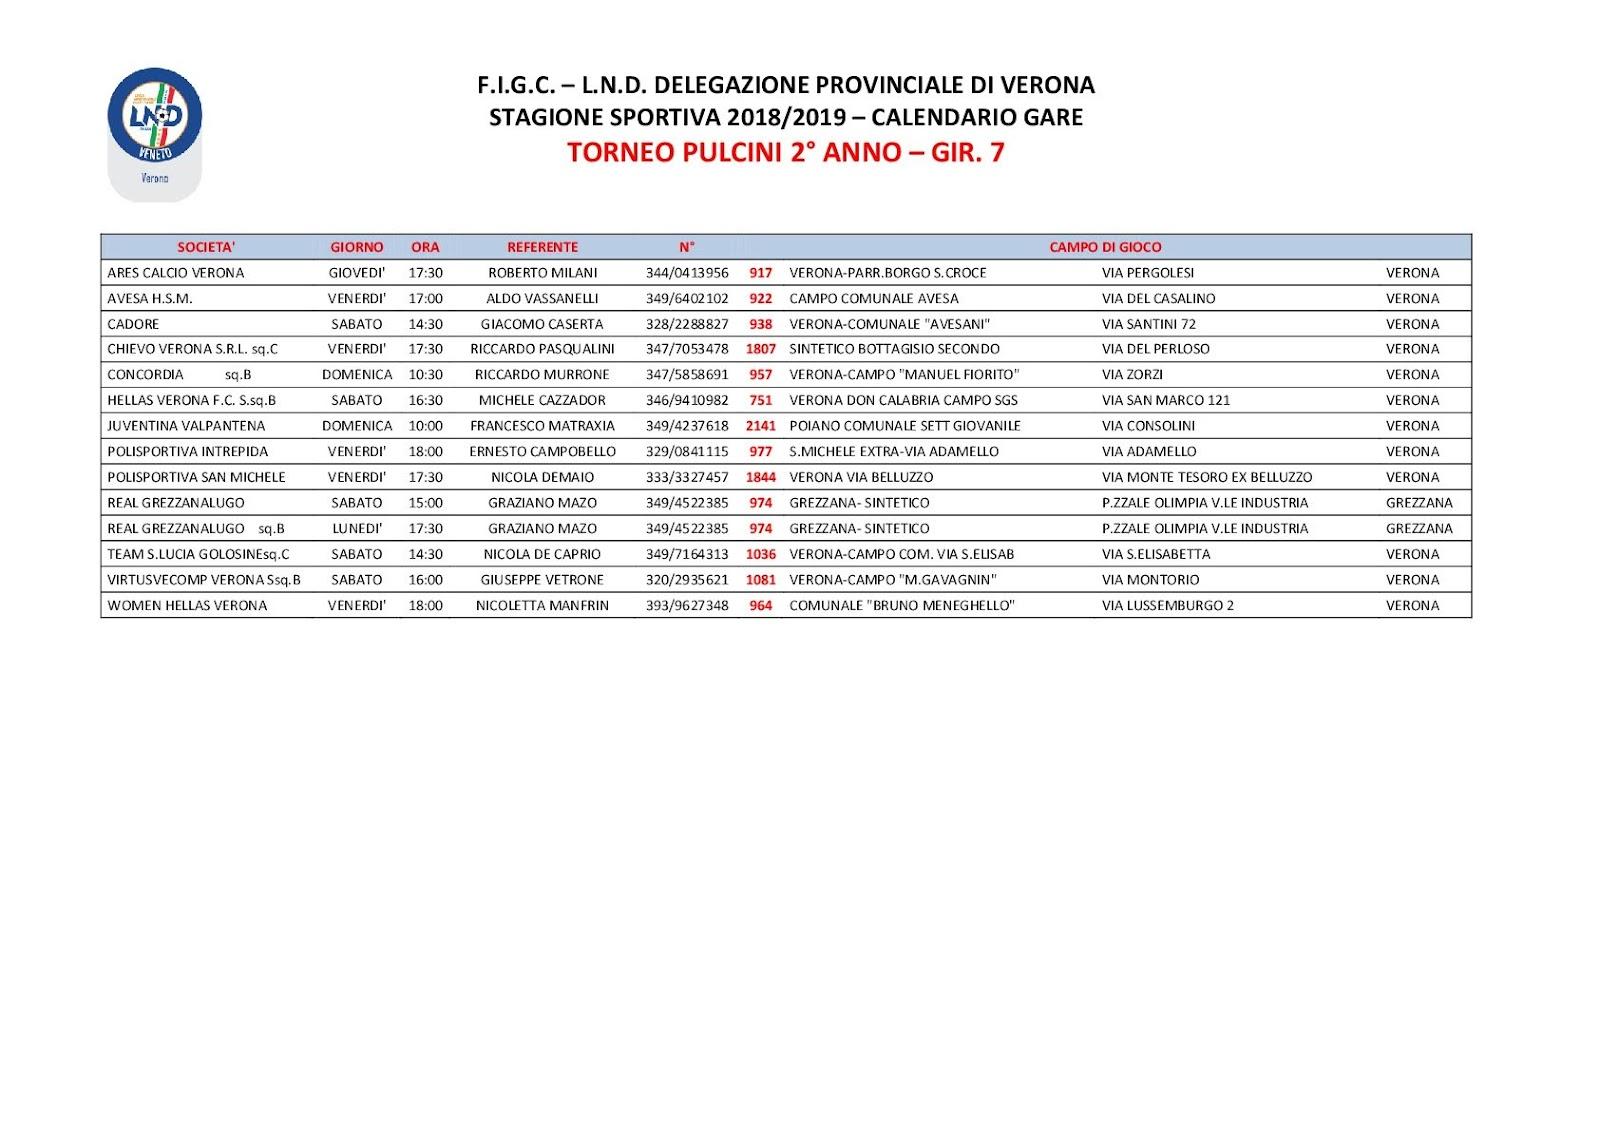 Calendario Pulcini 2006.Pulcini Ahsm 1911